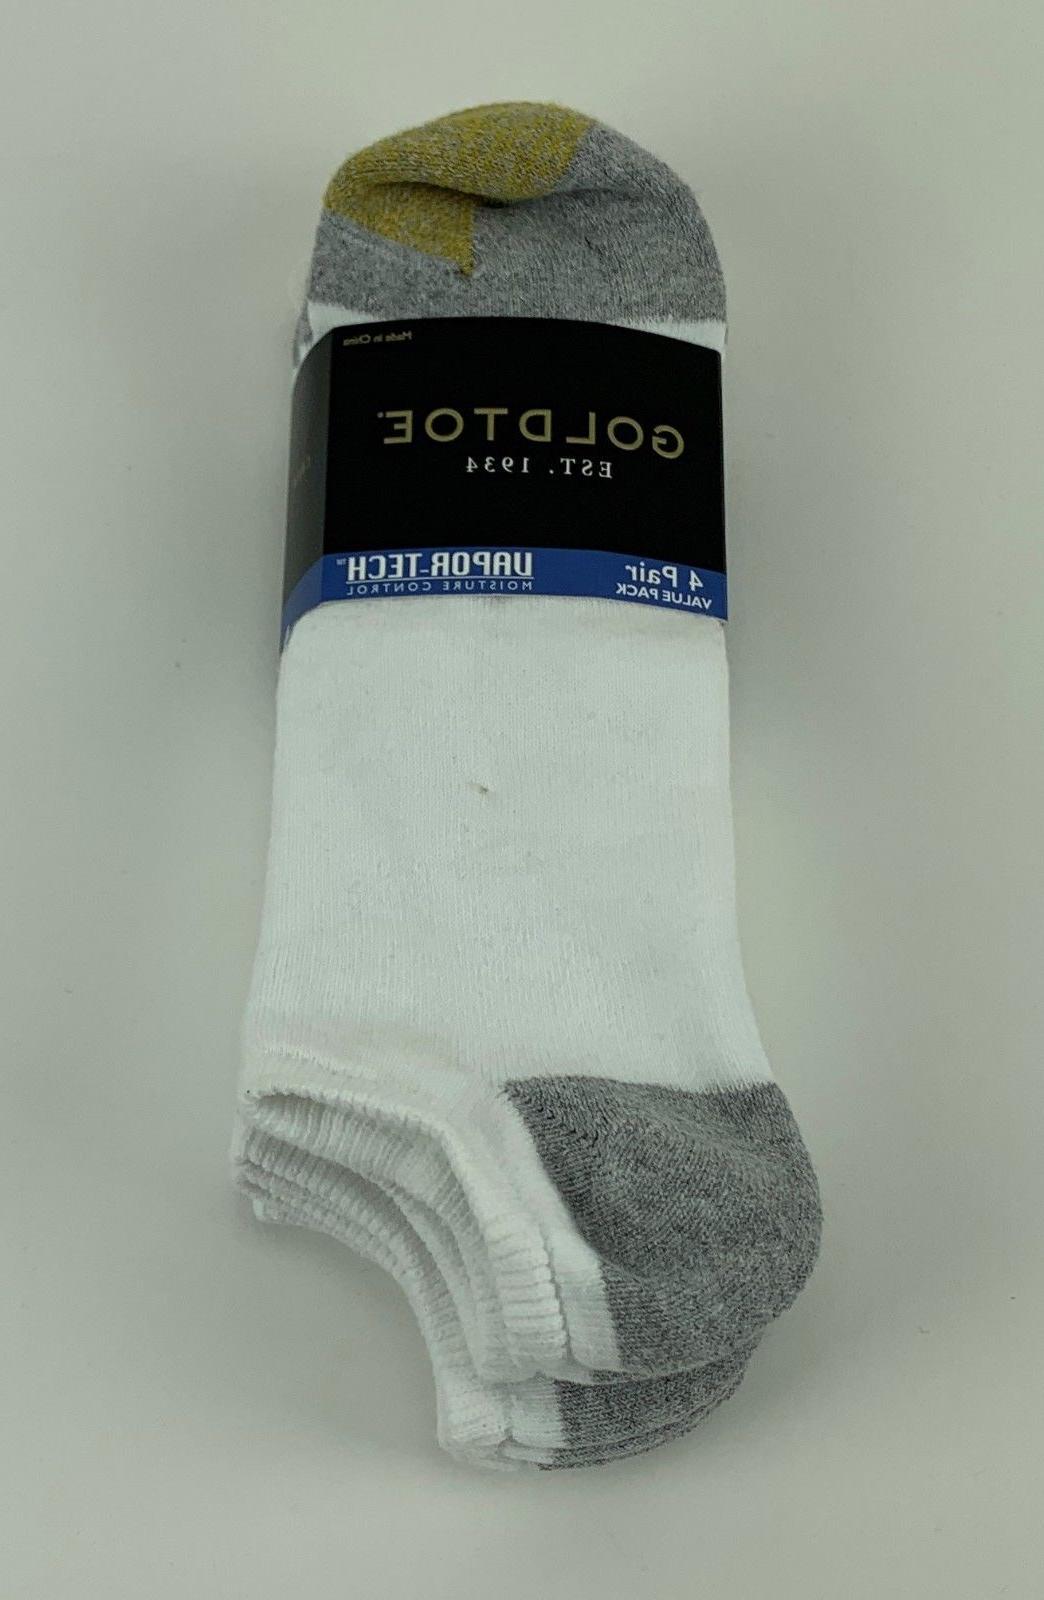 Gold Toe Men's Socks, Athletic Cushioned Liner 4 Pack